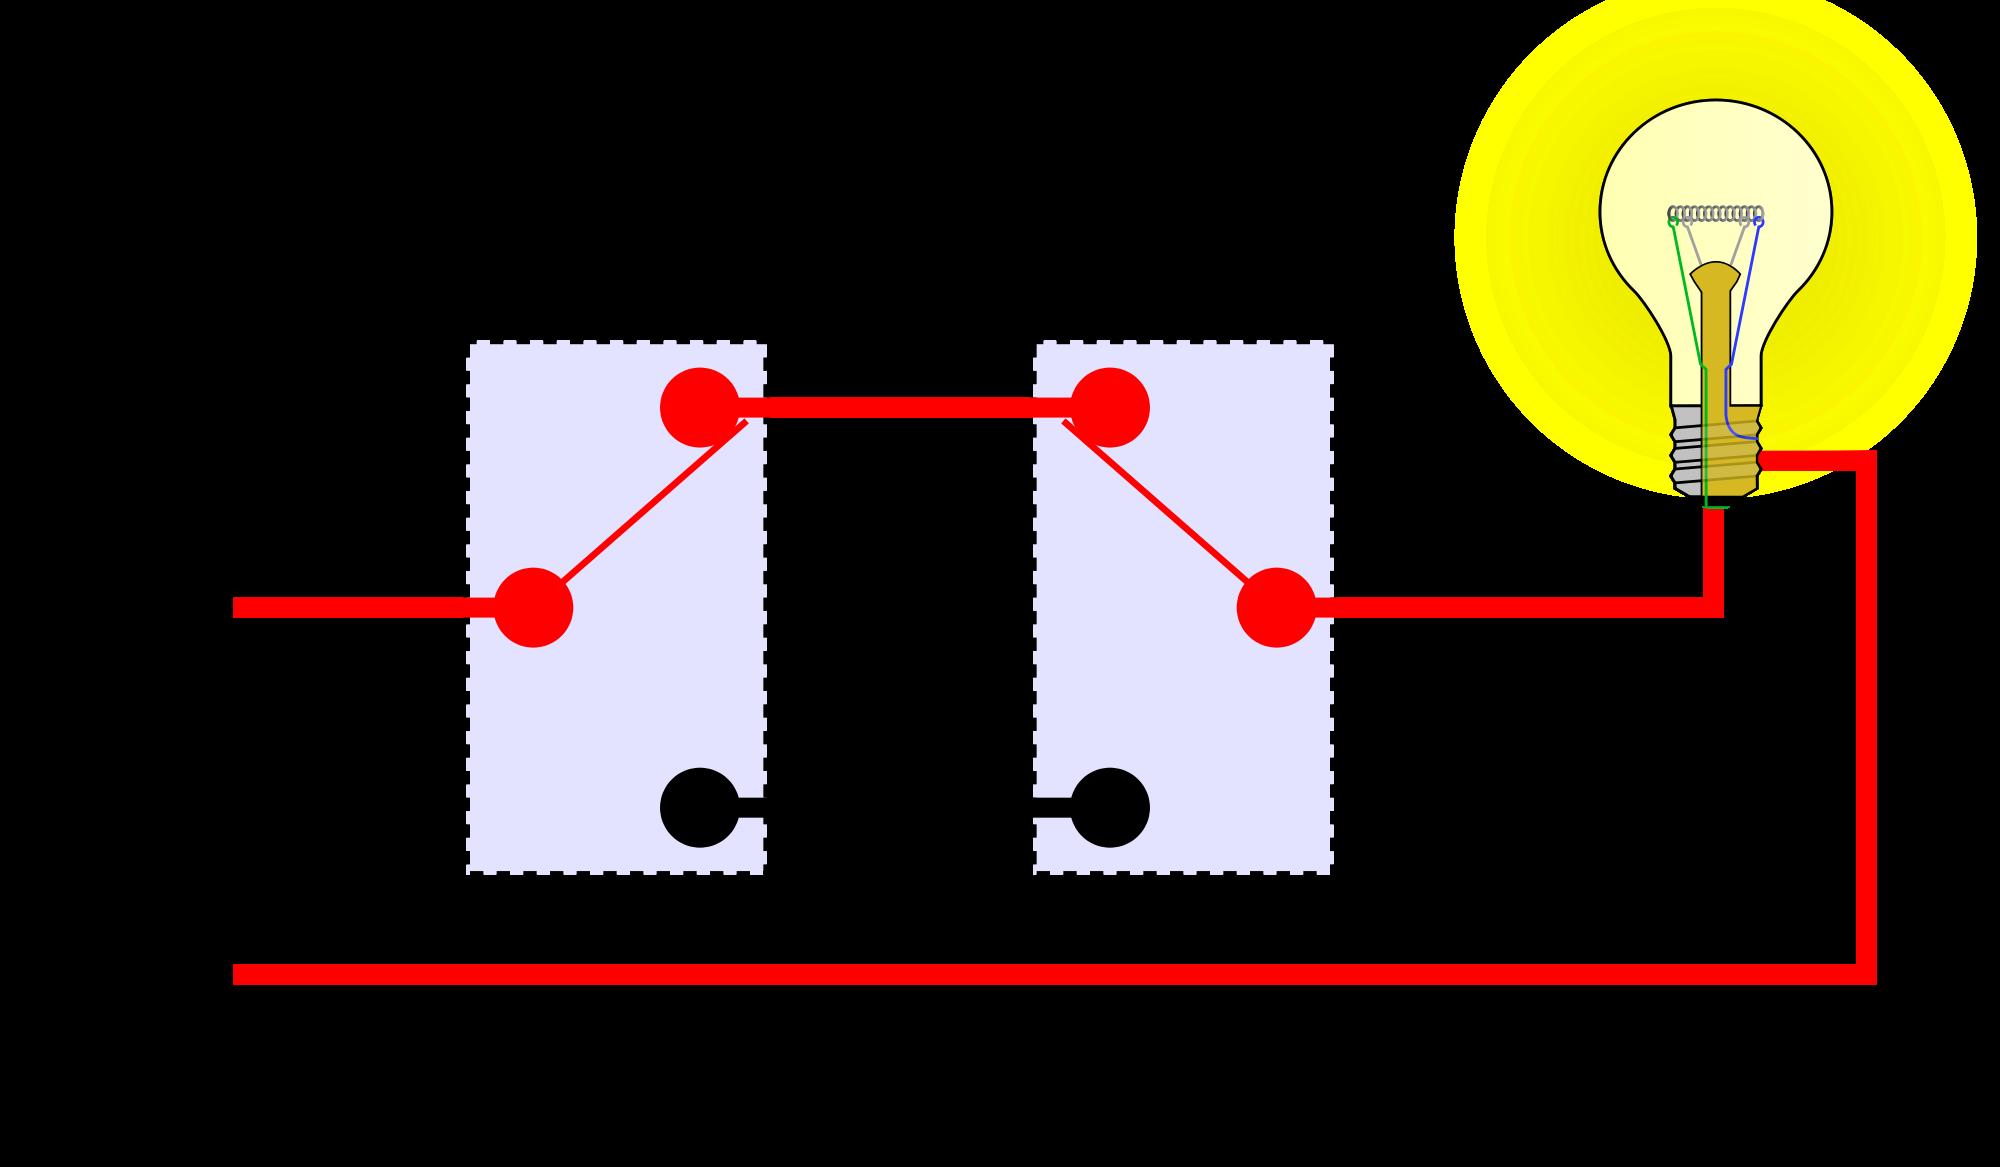 EA_6643] Double Pole Switch Wiring Diagram Free Download Schematic Wiring | Double Pole Switch Wiring Diagram Free Download |  | Erek Minaga Numap Unnu Denli Etic Vira Mohammedshrine Librar Wiring 101